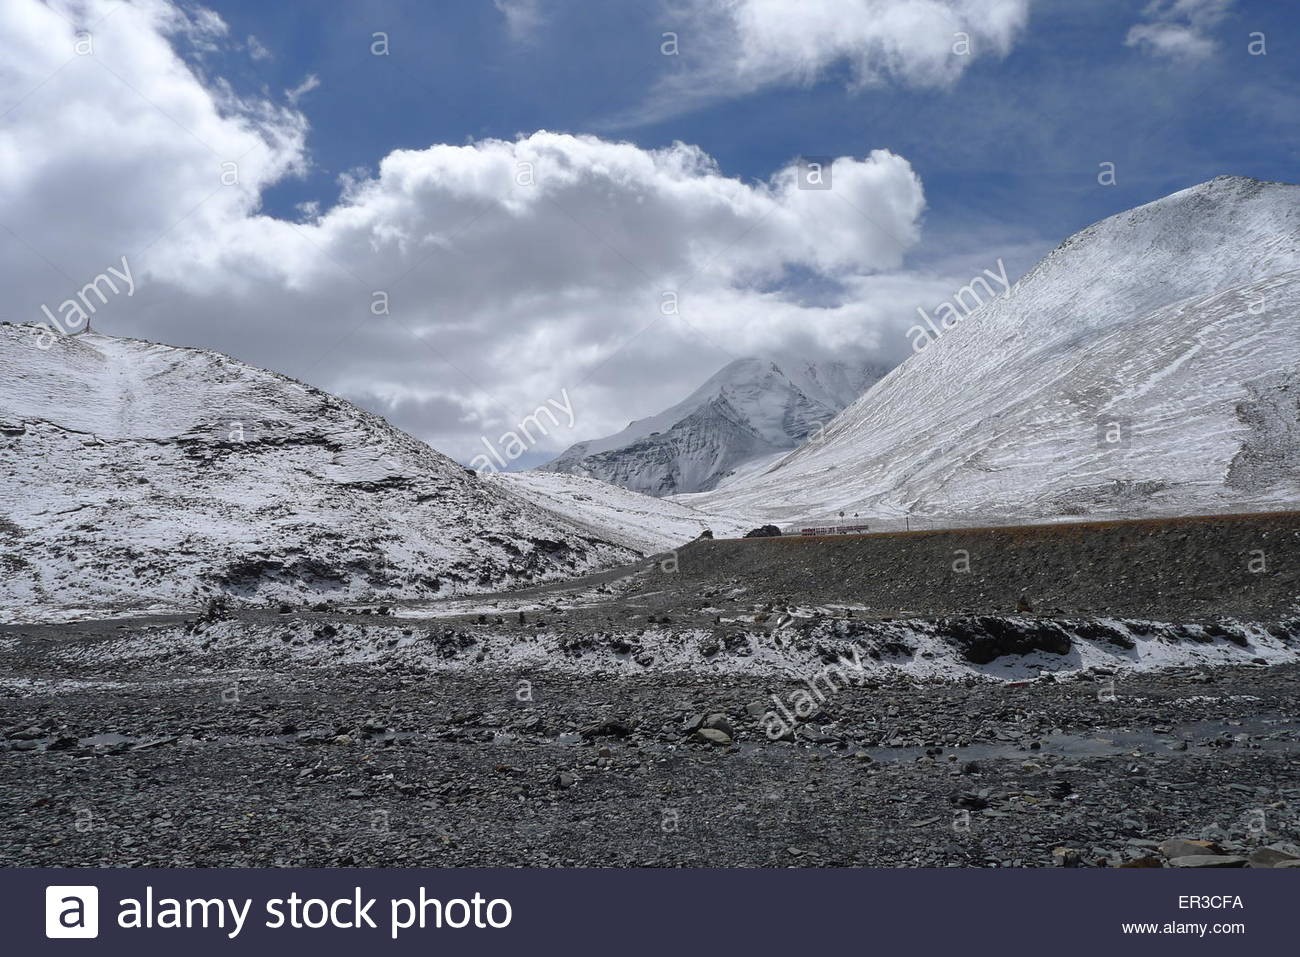 Glacier, Himalayas, Tibet, China - Stock Image